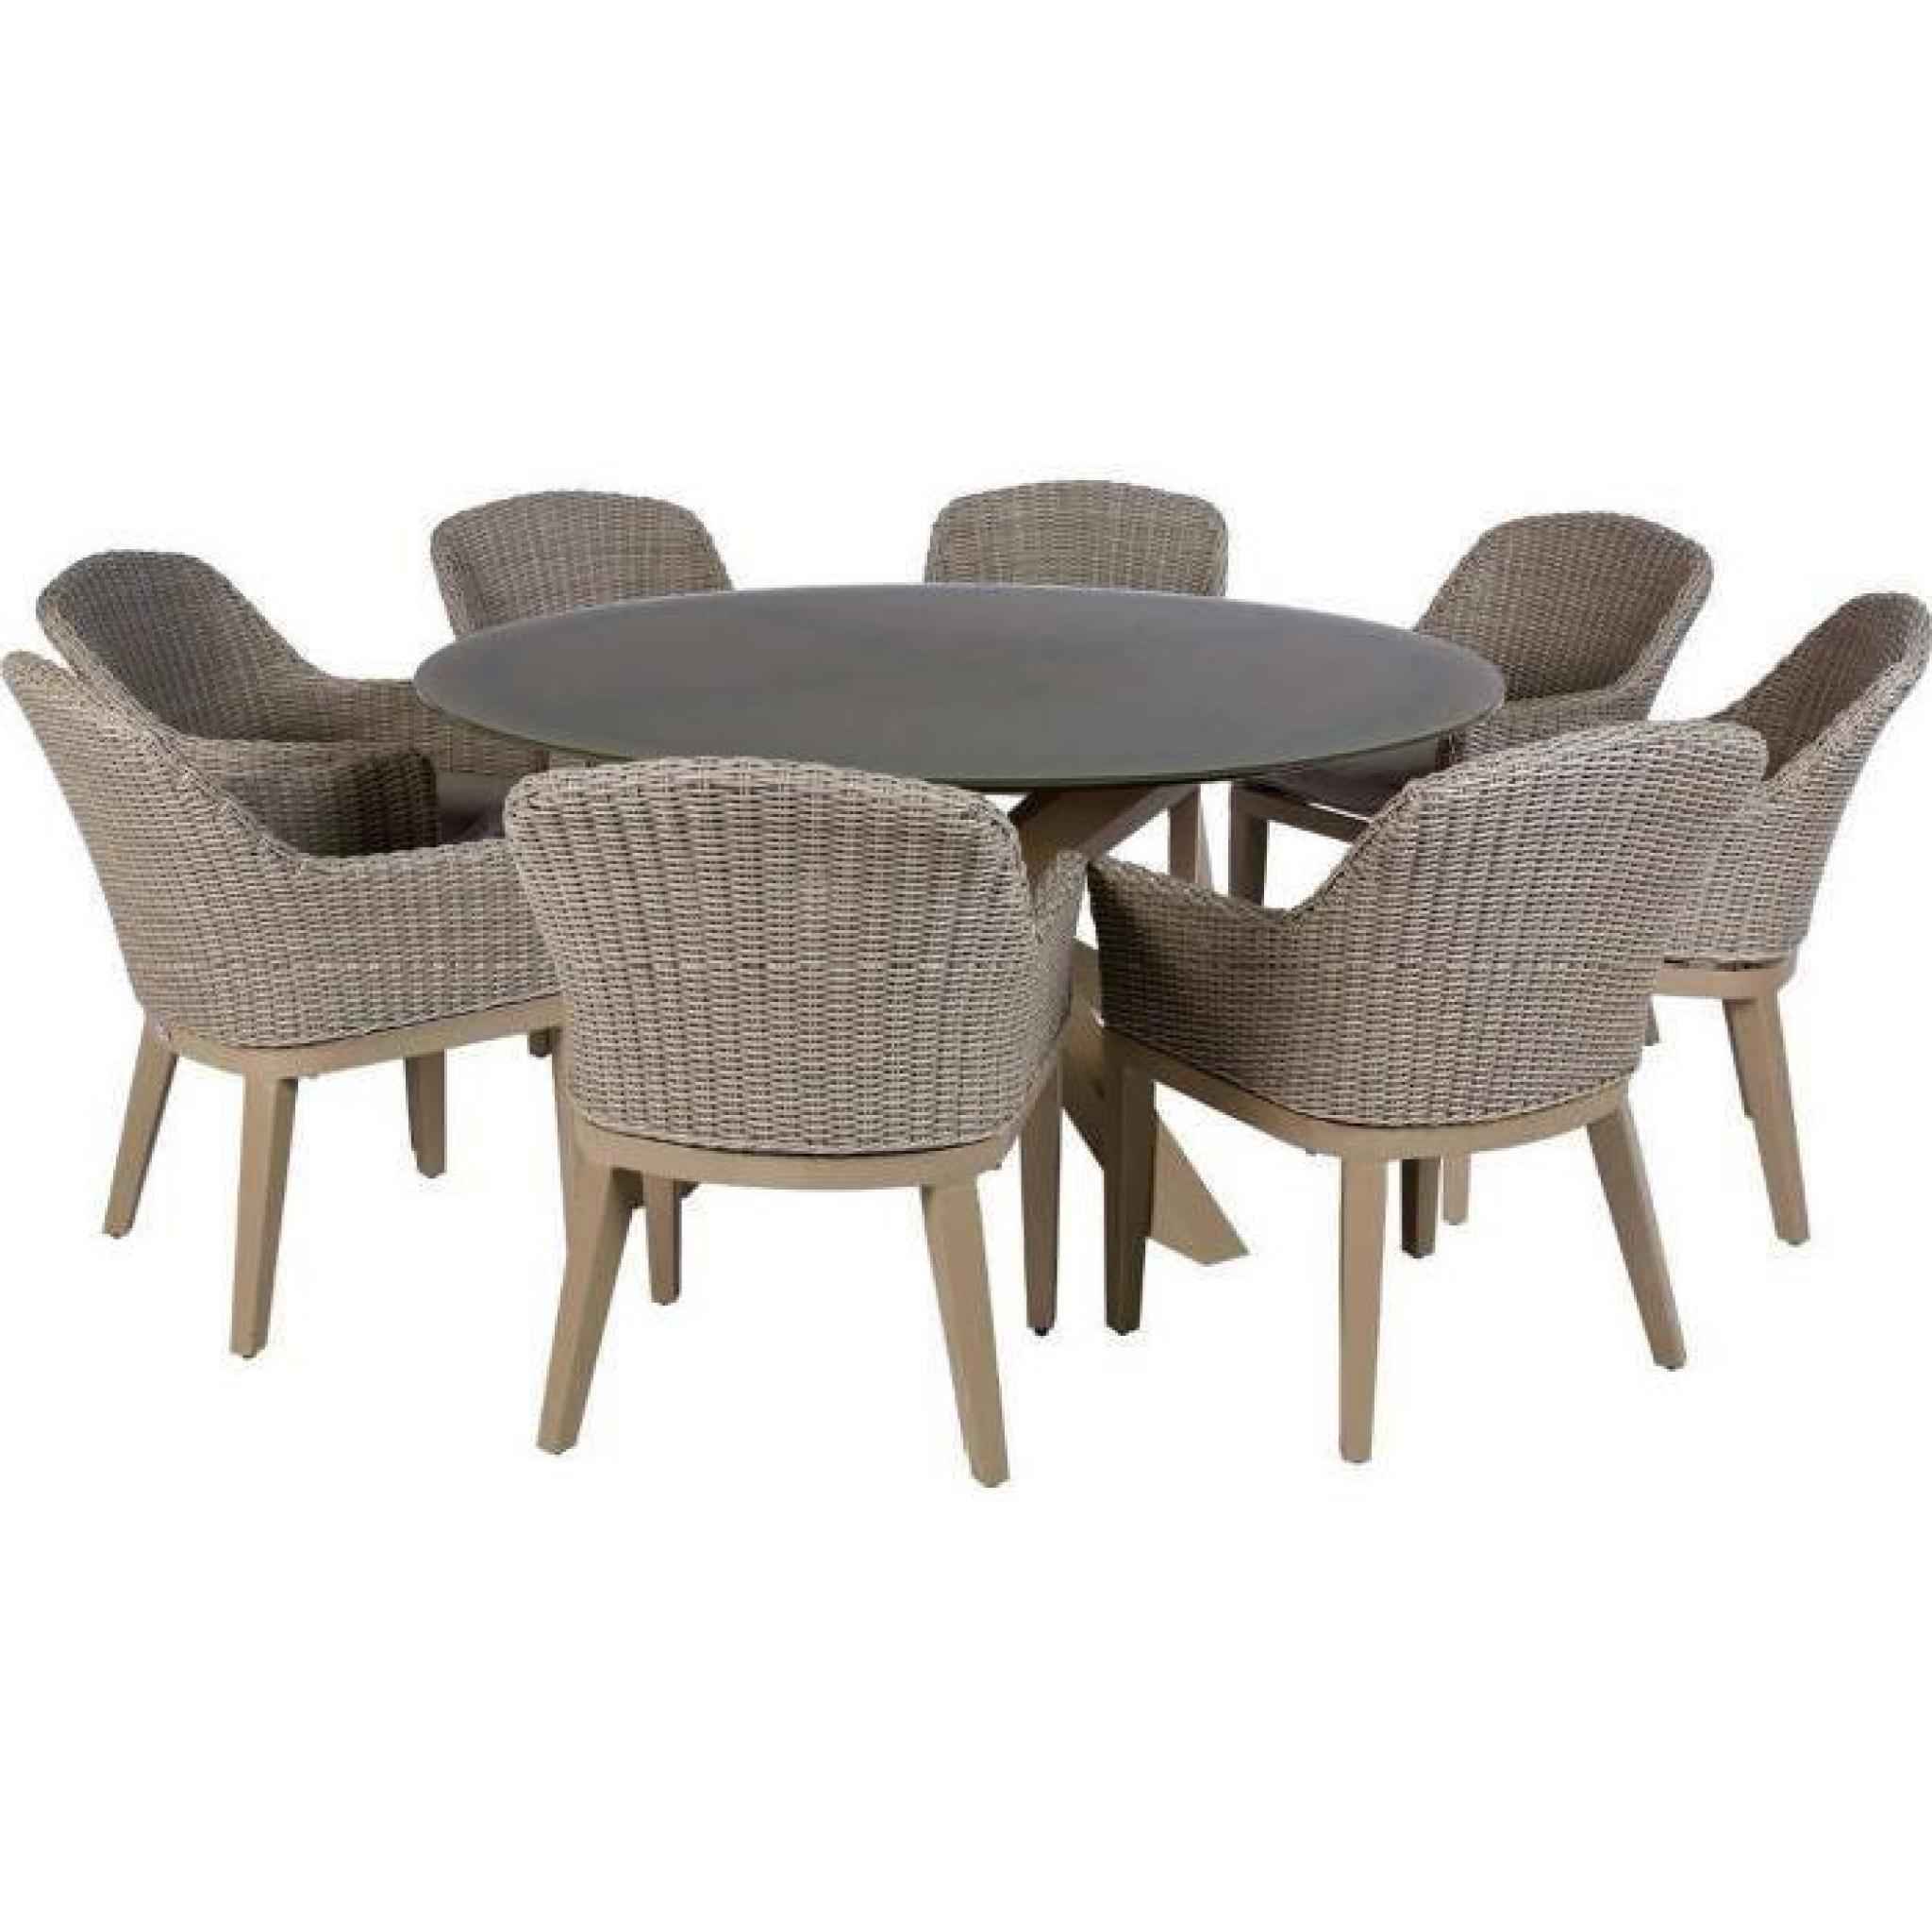 Table ronde de jardin en Aluminium coloris taupe - Dim : D 160 x H 75cm